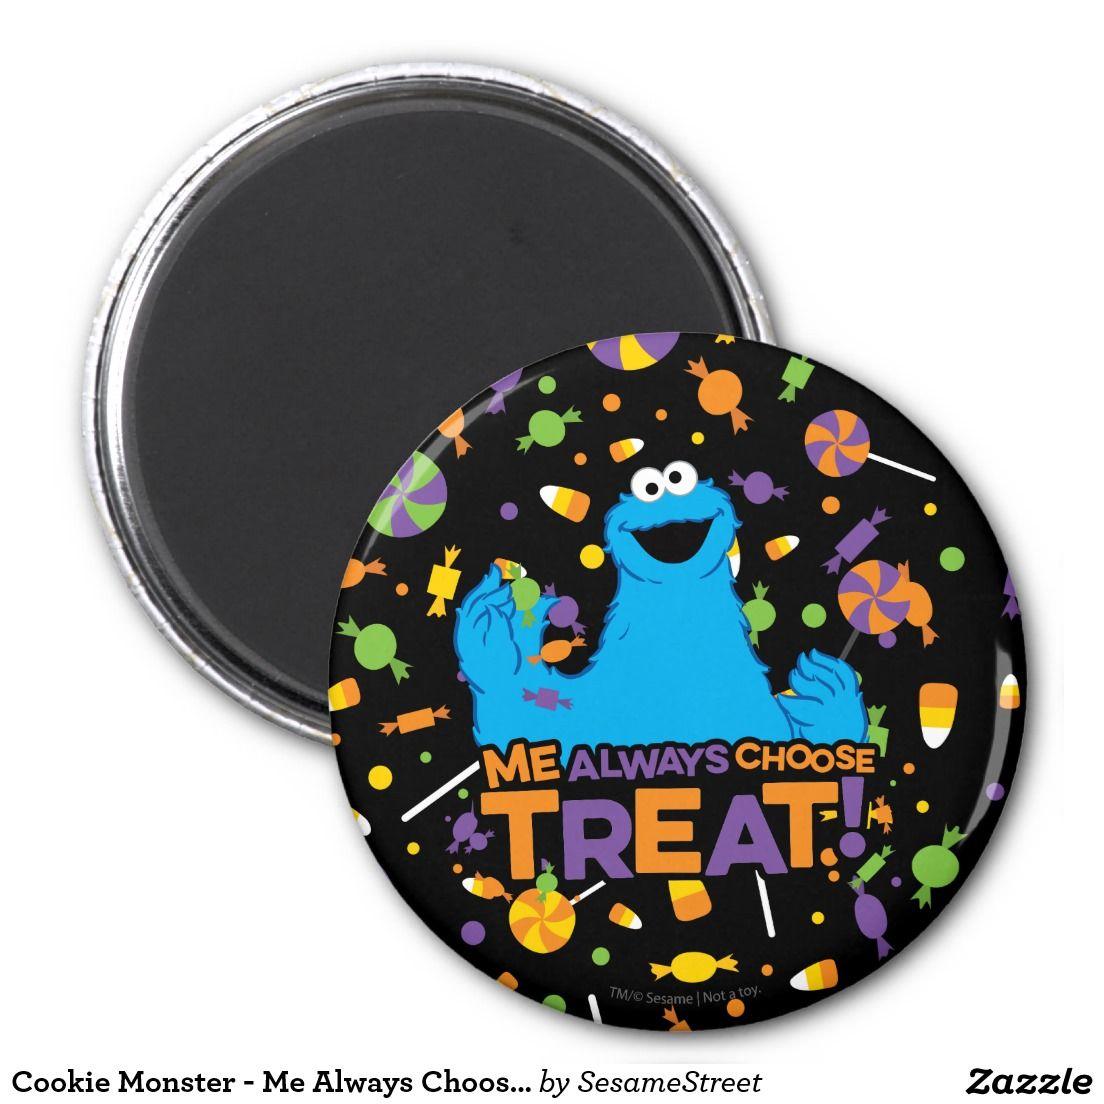 Cookie Monster - Me Always Choose Treat. Regalos, Gifts. #imanes #magnets